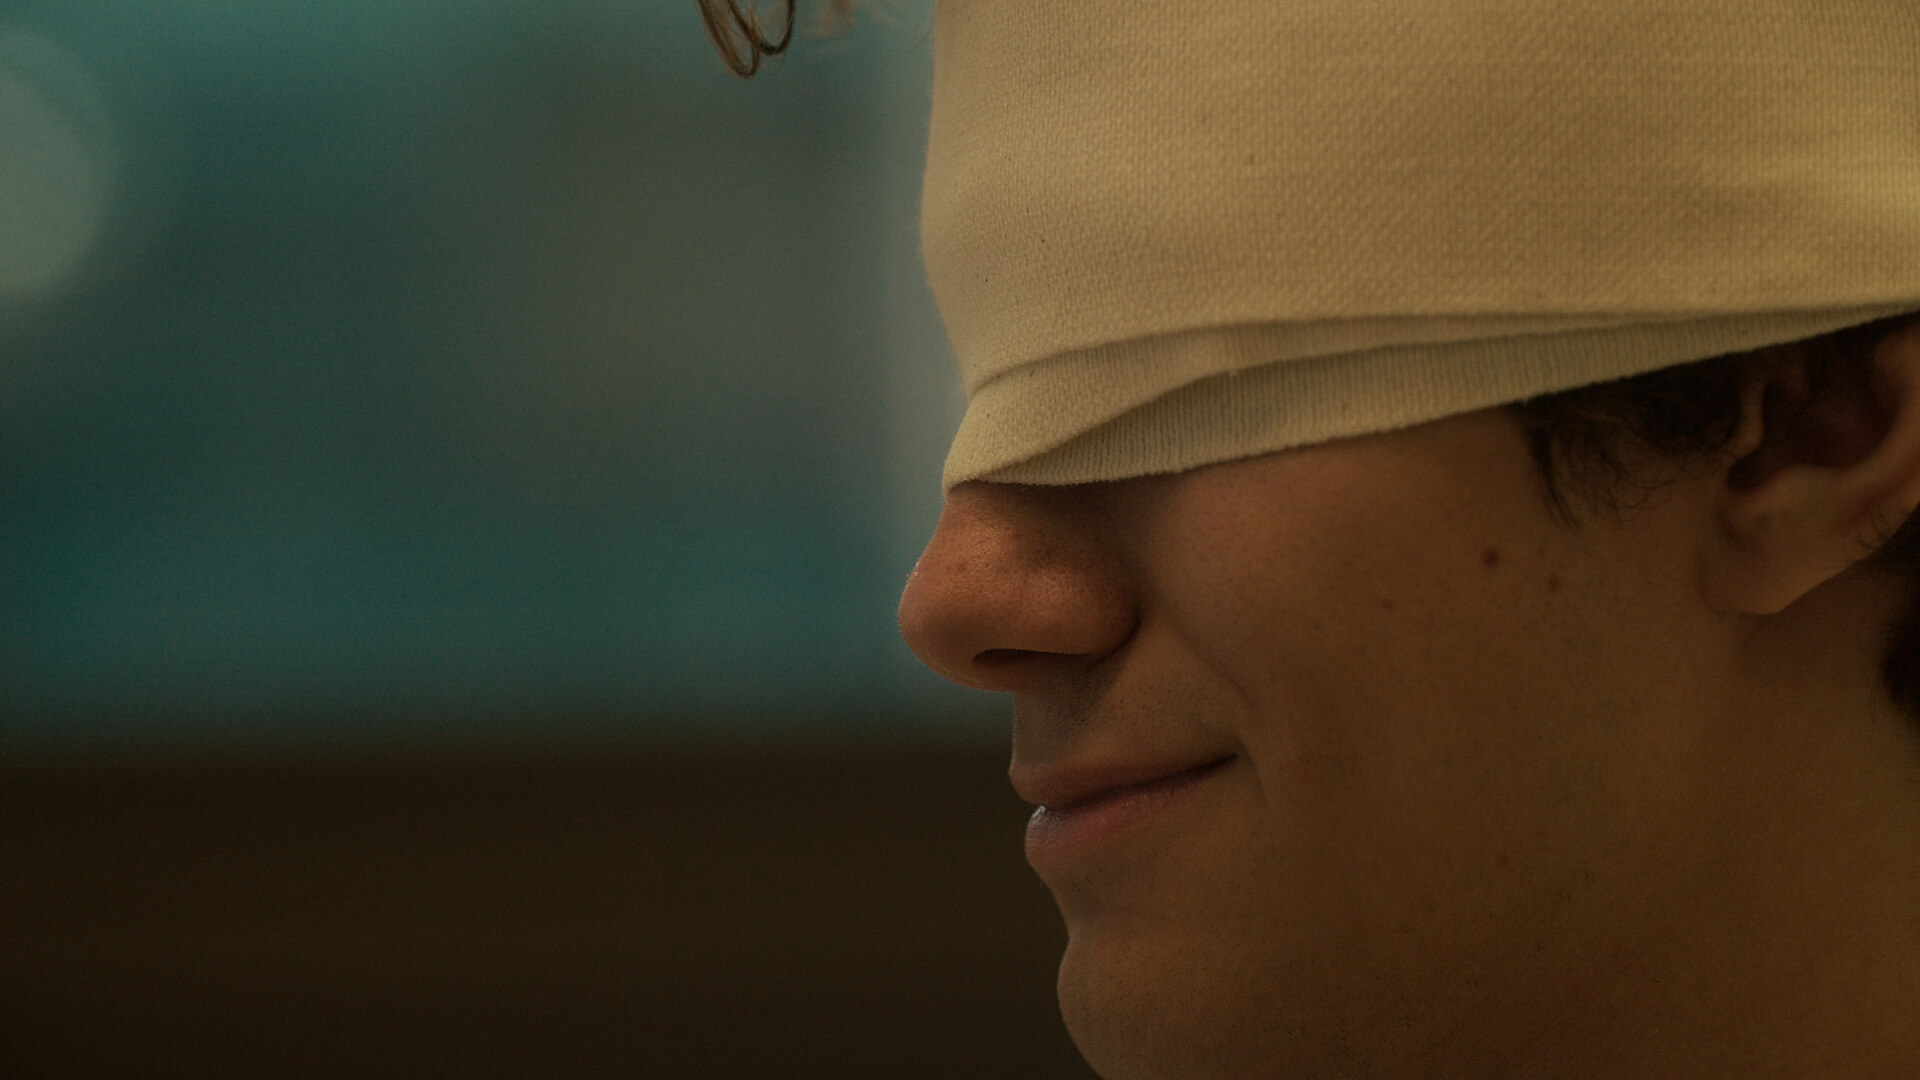 Sore Sight for Blind Eyes - Still Image